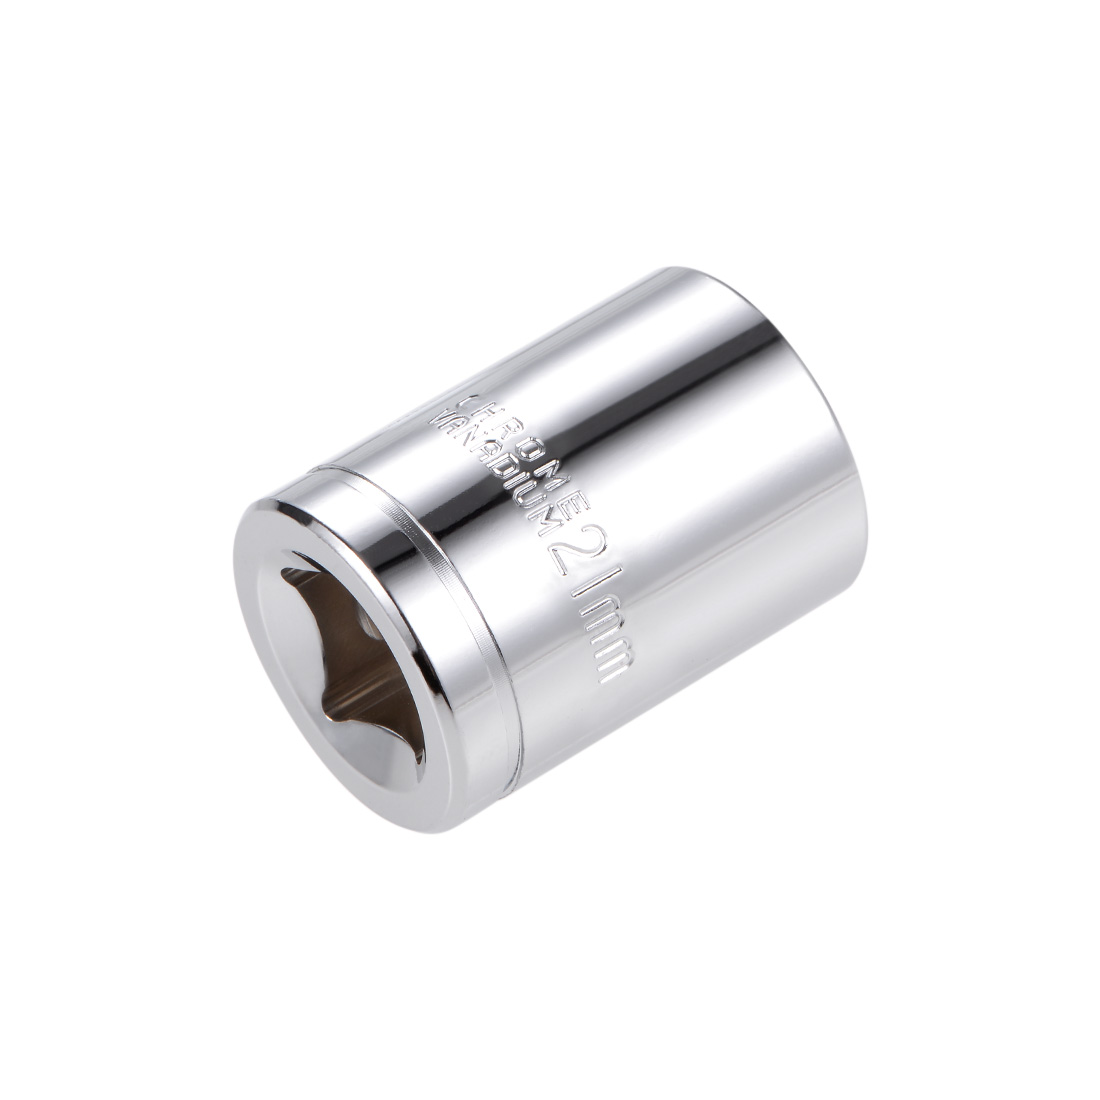 1/2-inch Drive E21 Universal Spline Socket Shallow 12 Point Cr-V Steel